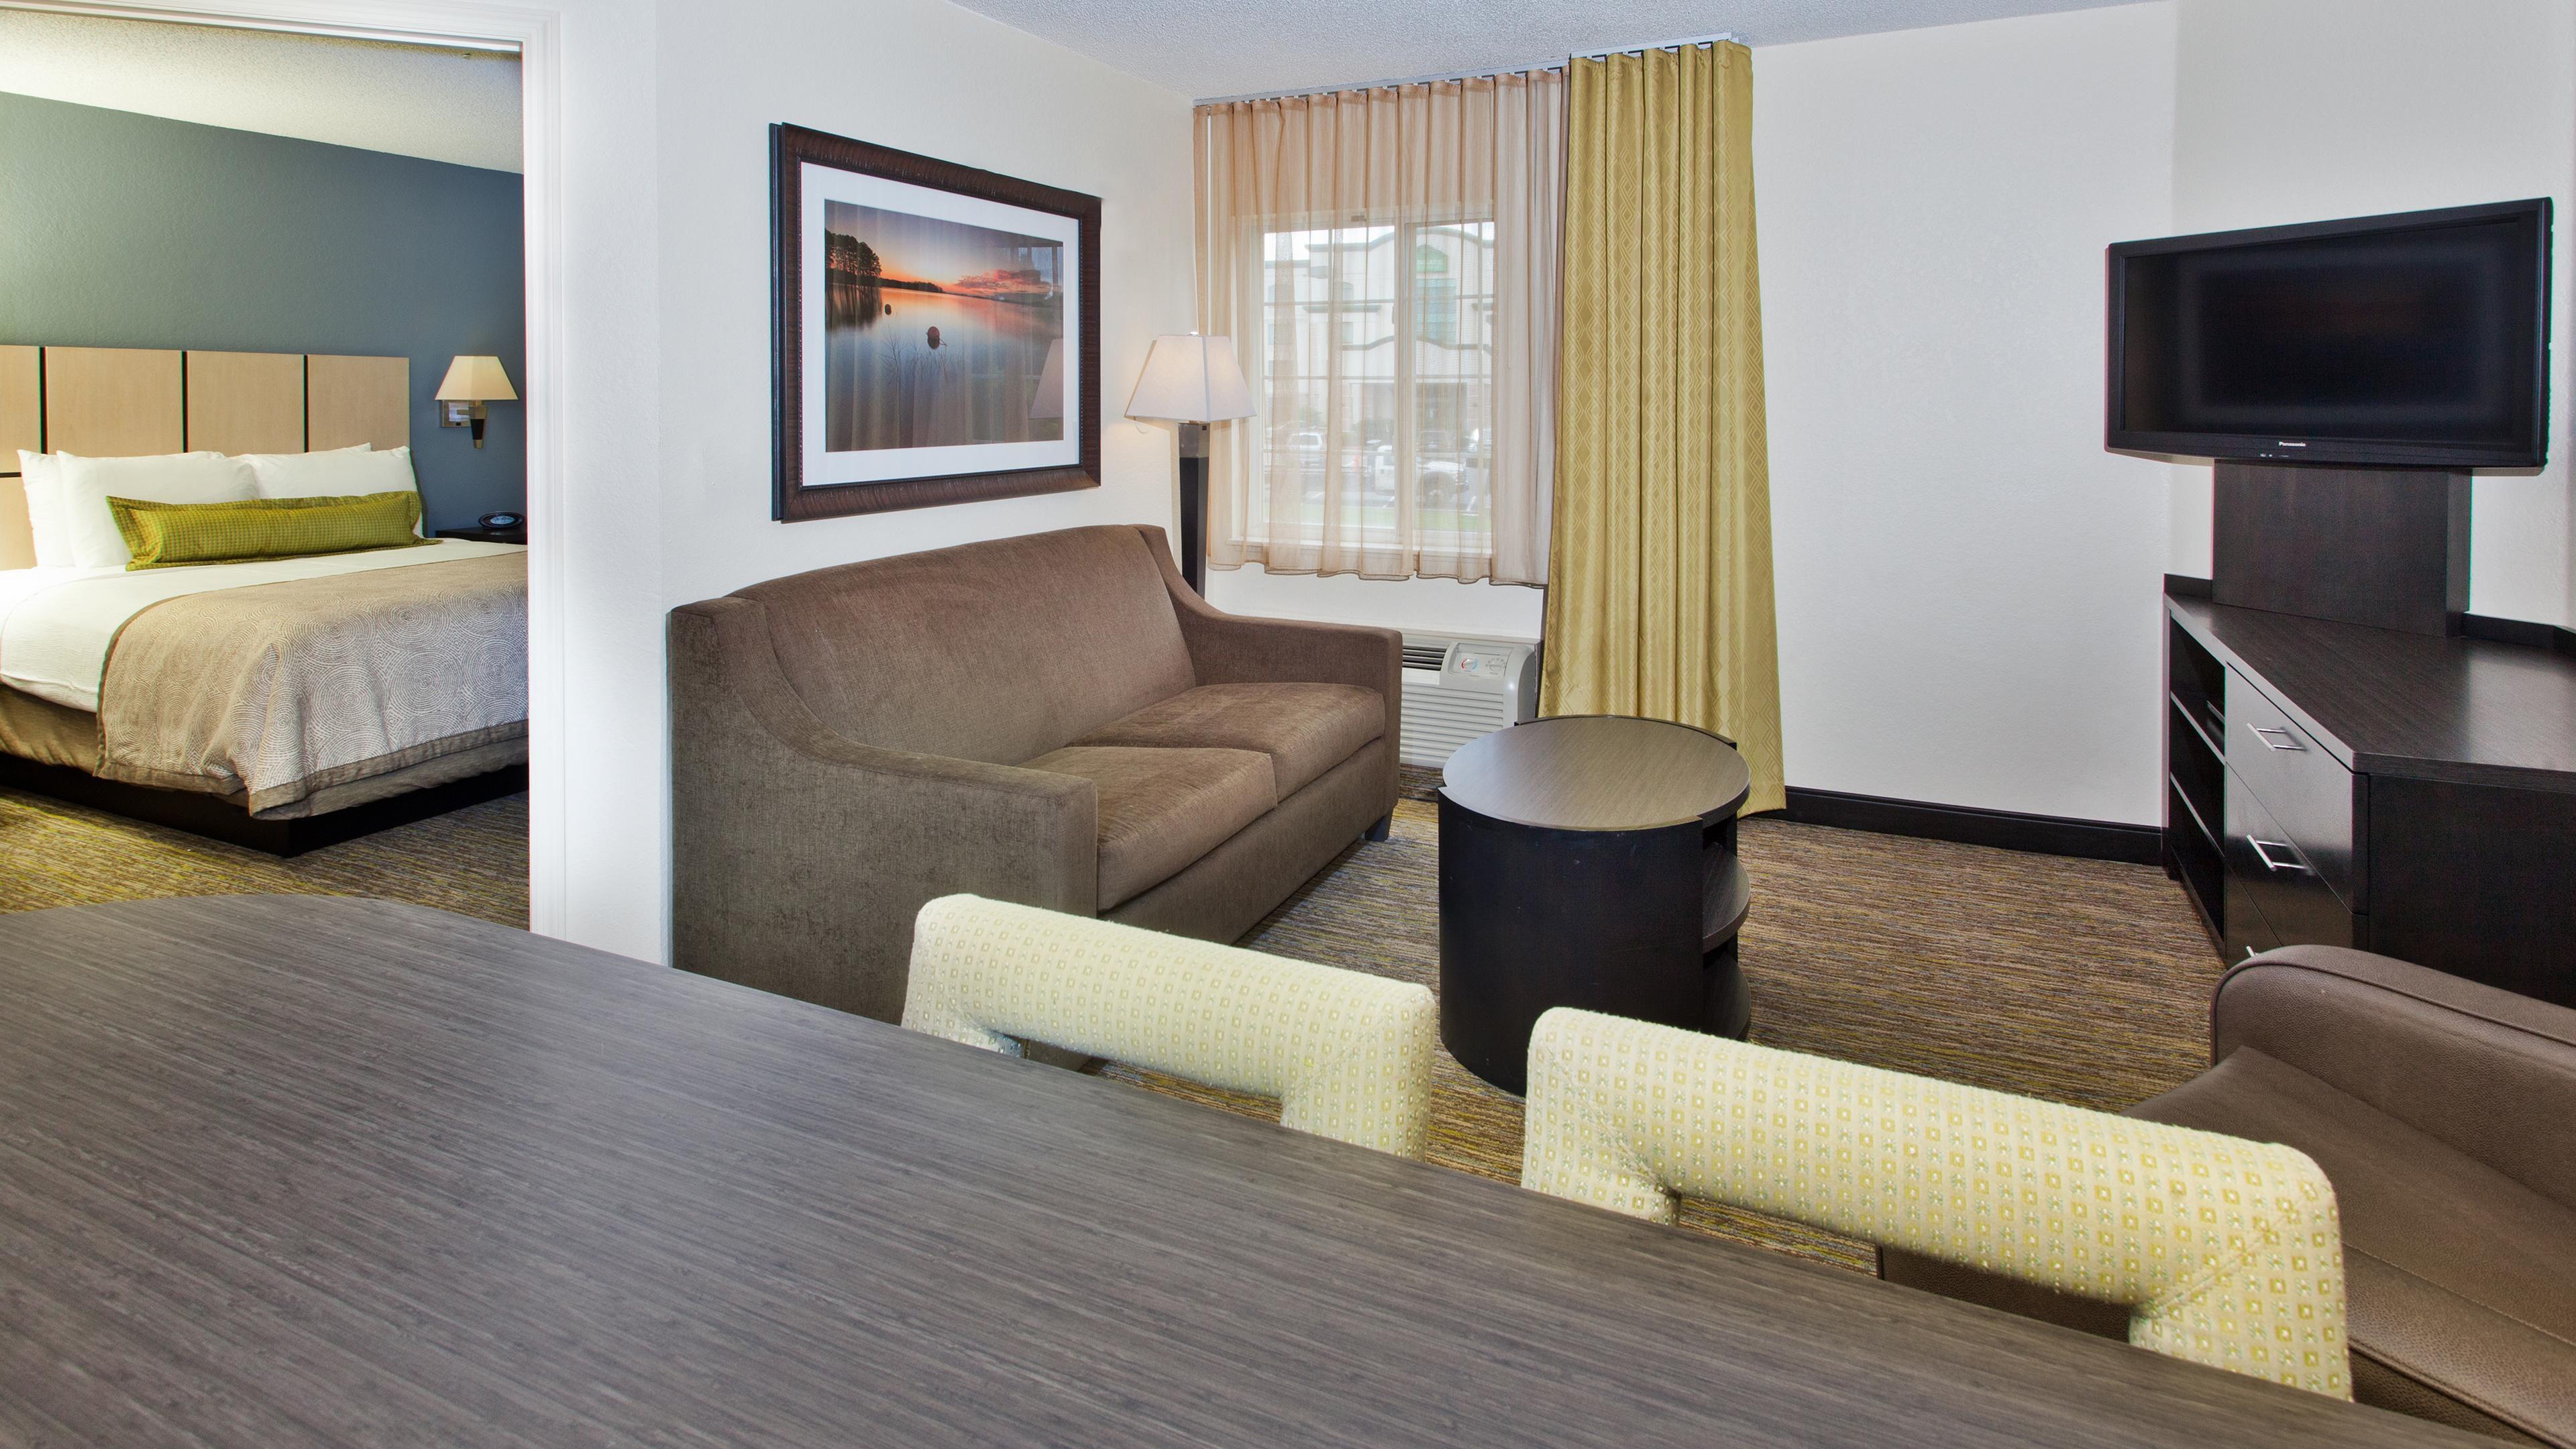 Hotels near Irvine Spectrum | Candlewood Suites Orange